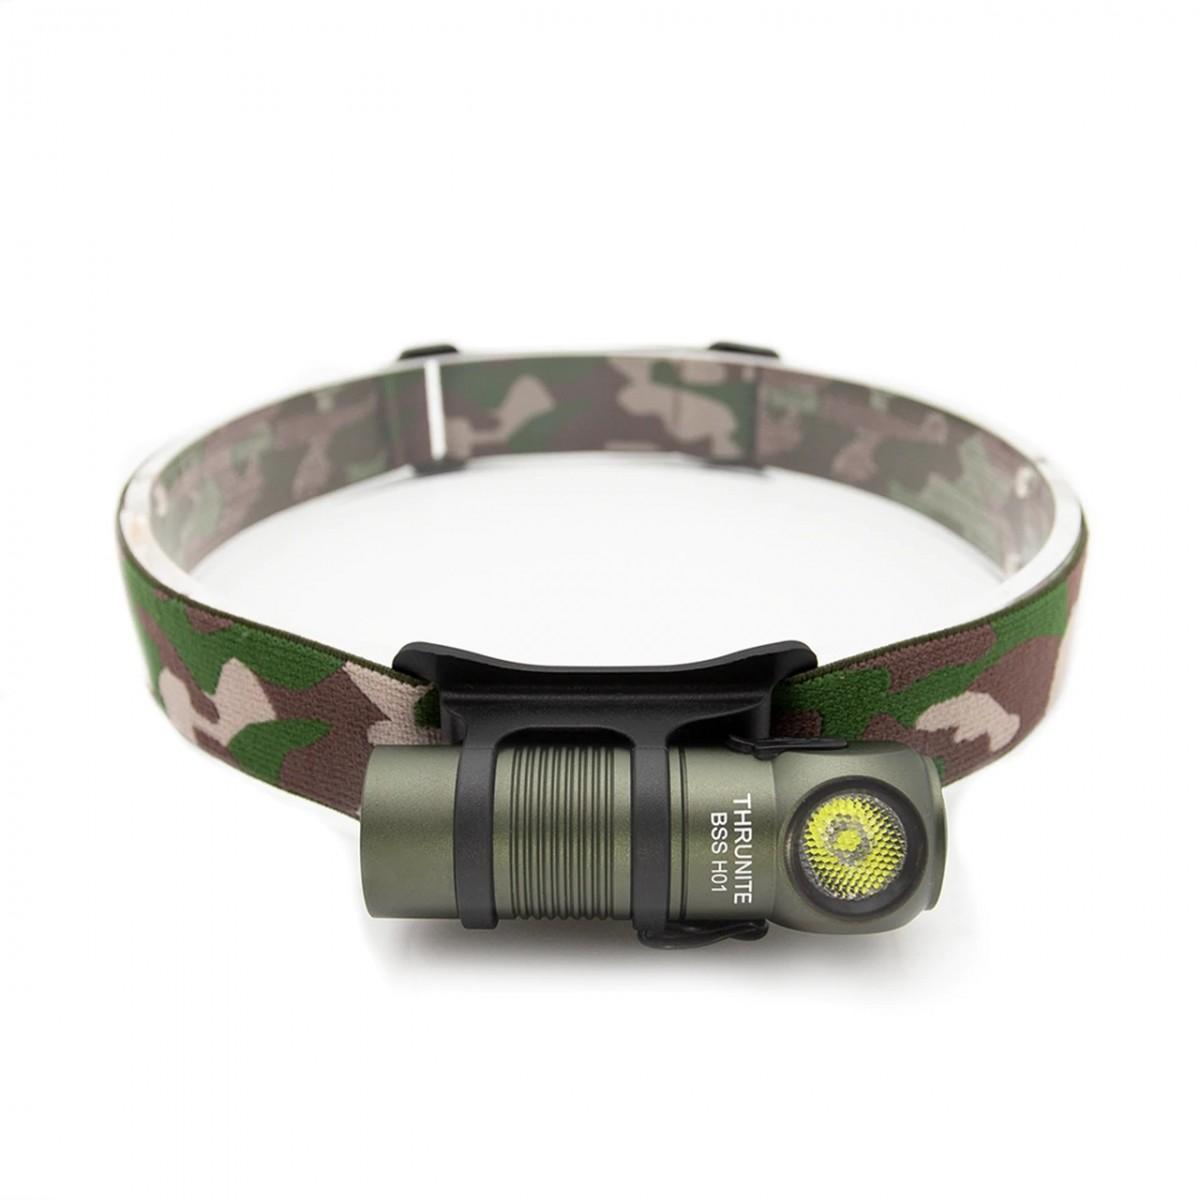 ThruNite BSS H01 Green CREE XP-G3 CW LED 687L USB Rechargeable Headlamp Flashlight